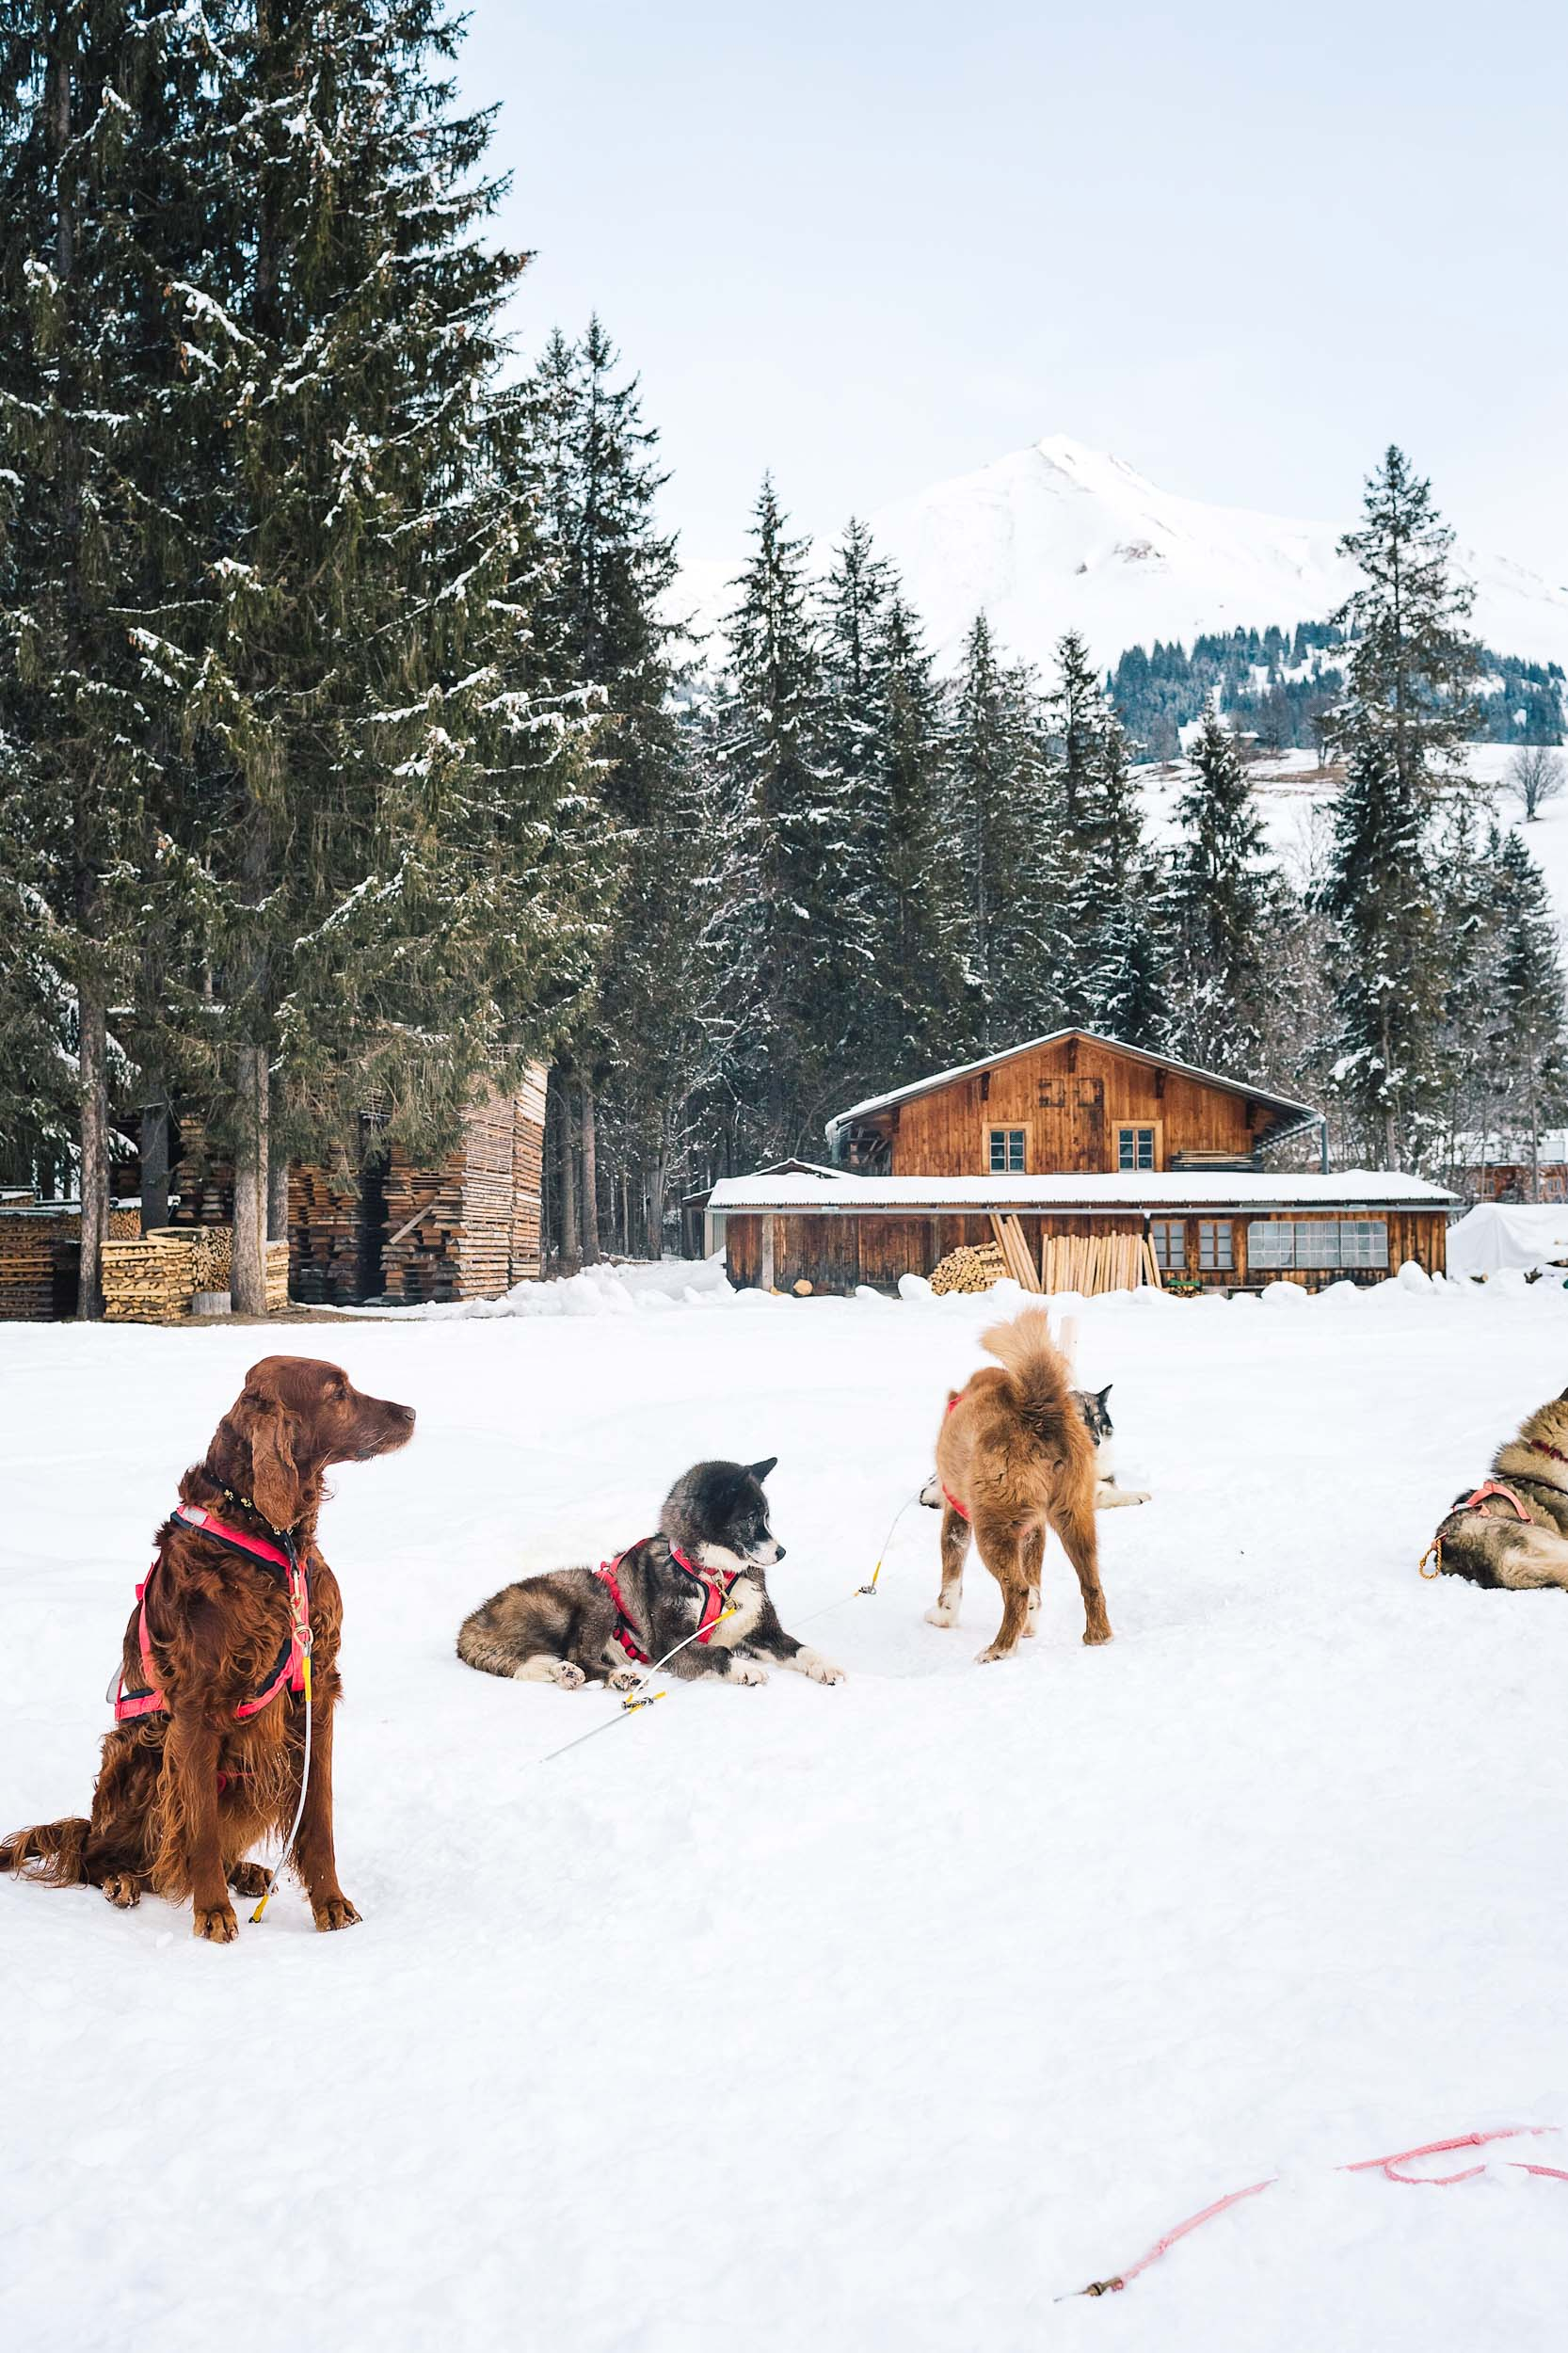 Dogs ready to take us sledding in Switzerland